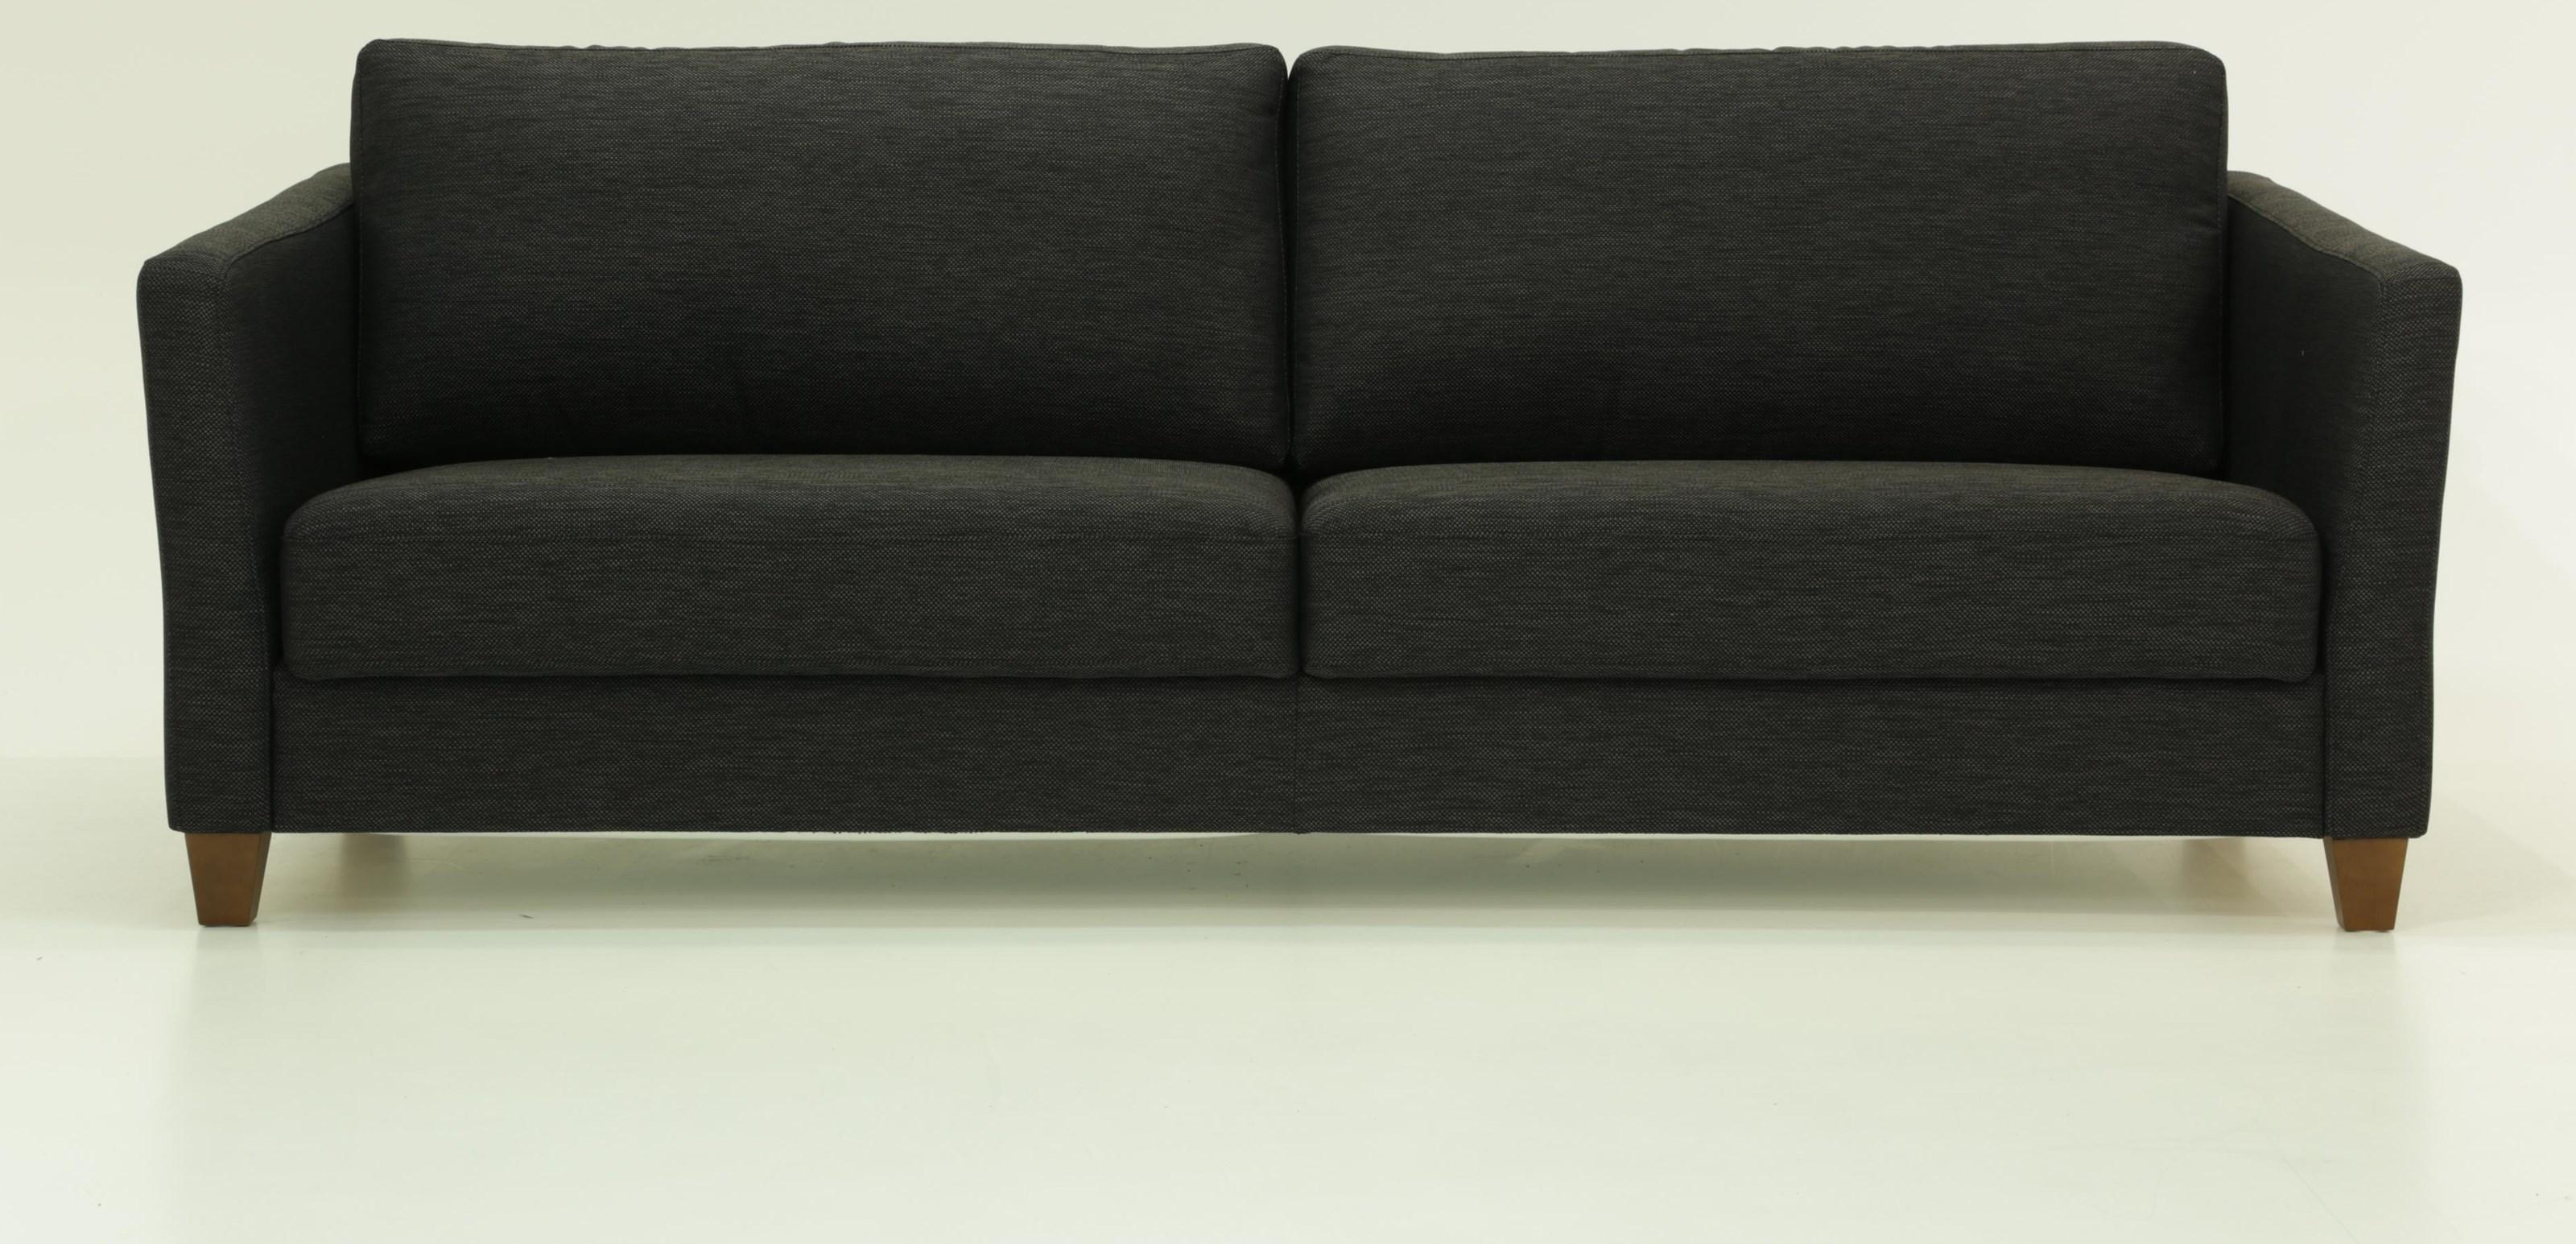 Monika King Sleeper by Luonto at Belfort Furniture